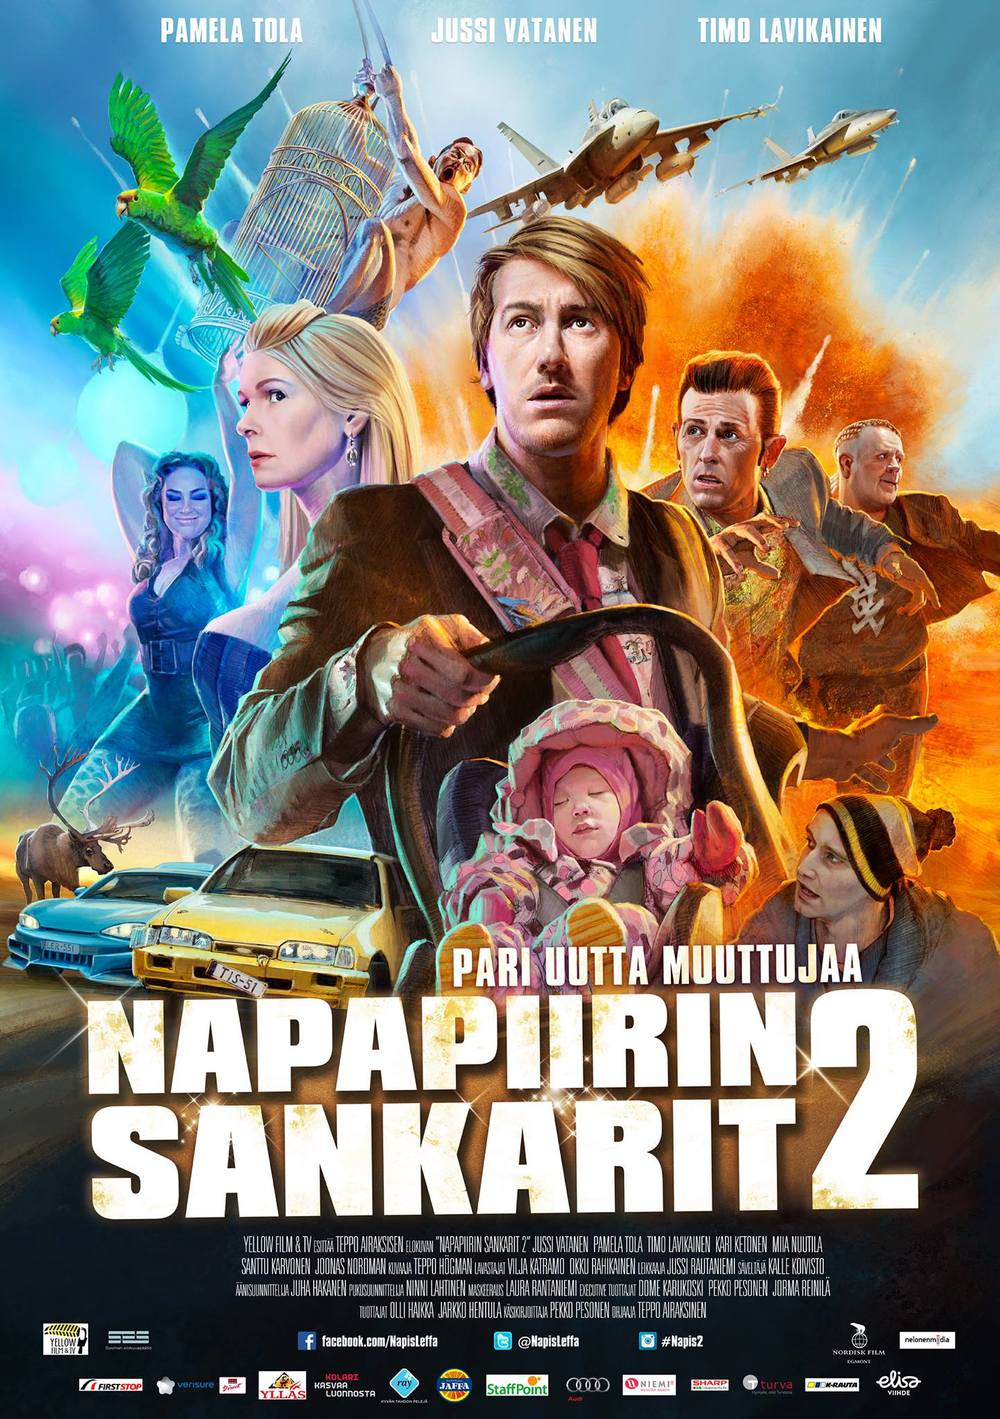 Napapiirin sankarit 2 – Lapland Odyssey  dir. Teppo Airaksinen Yellow Film & Tv / 2015